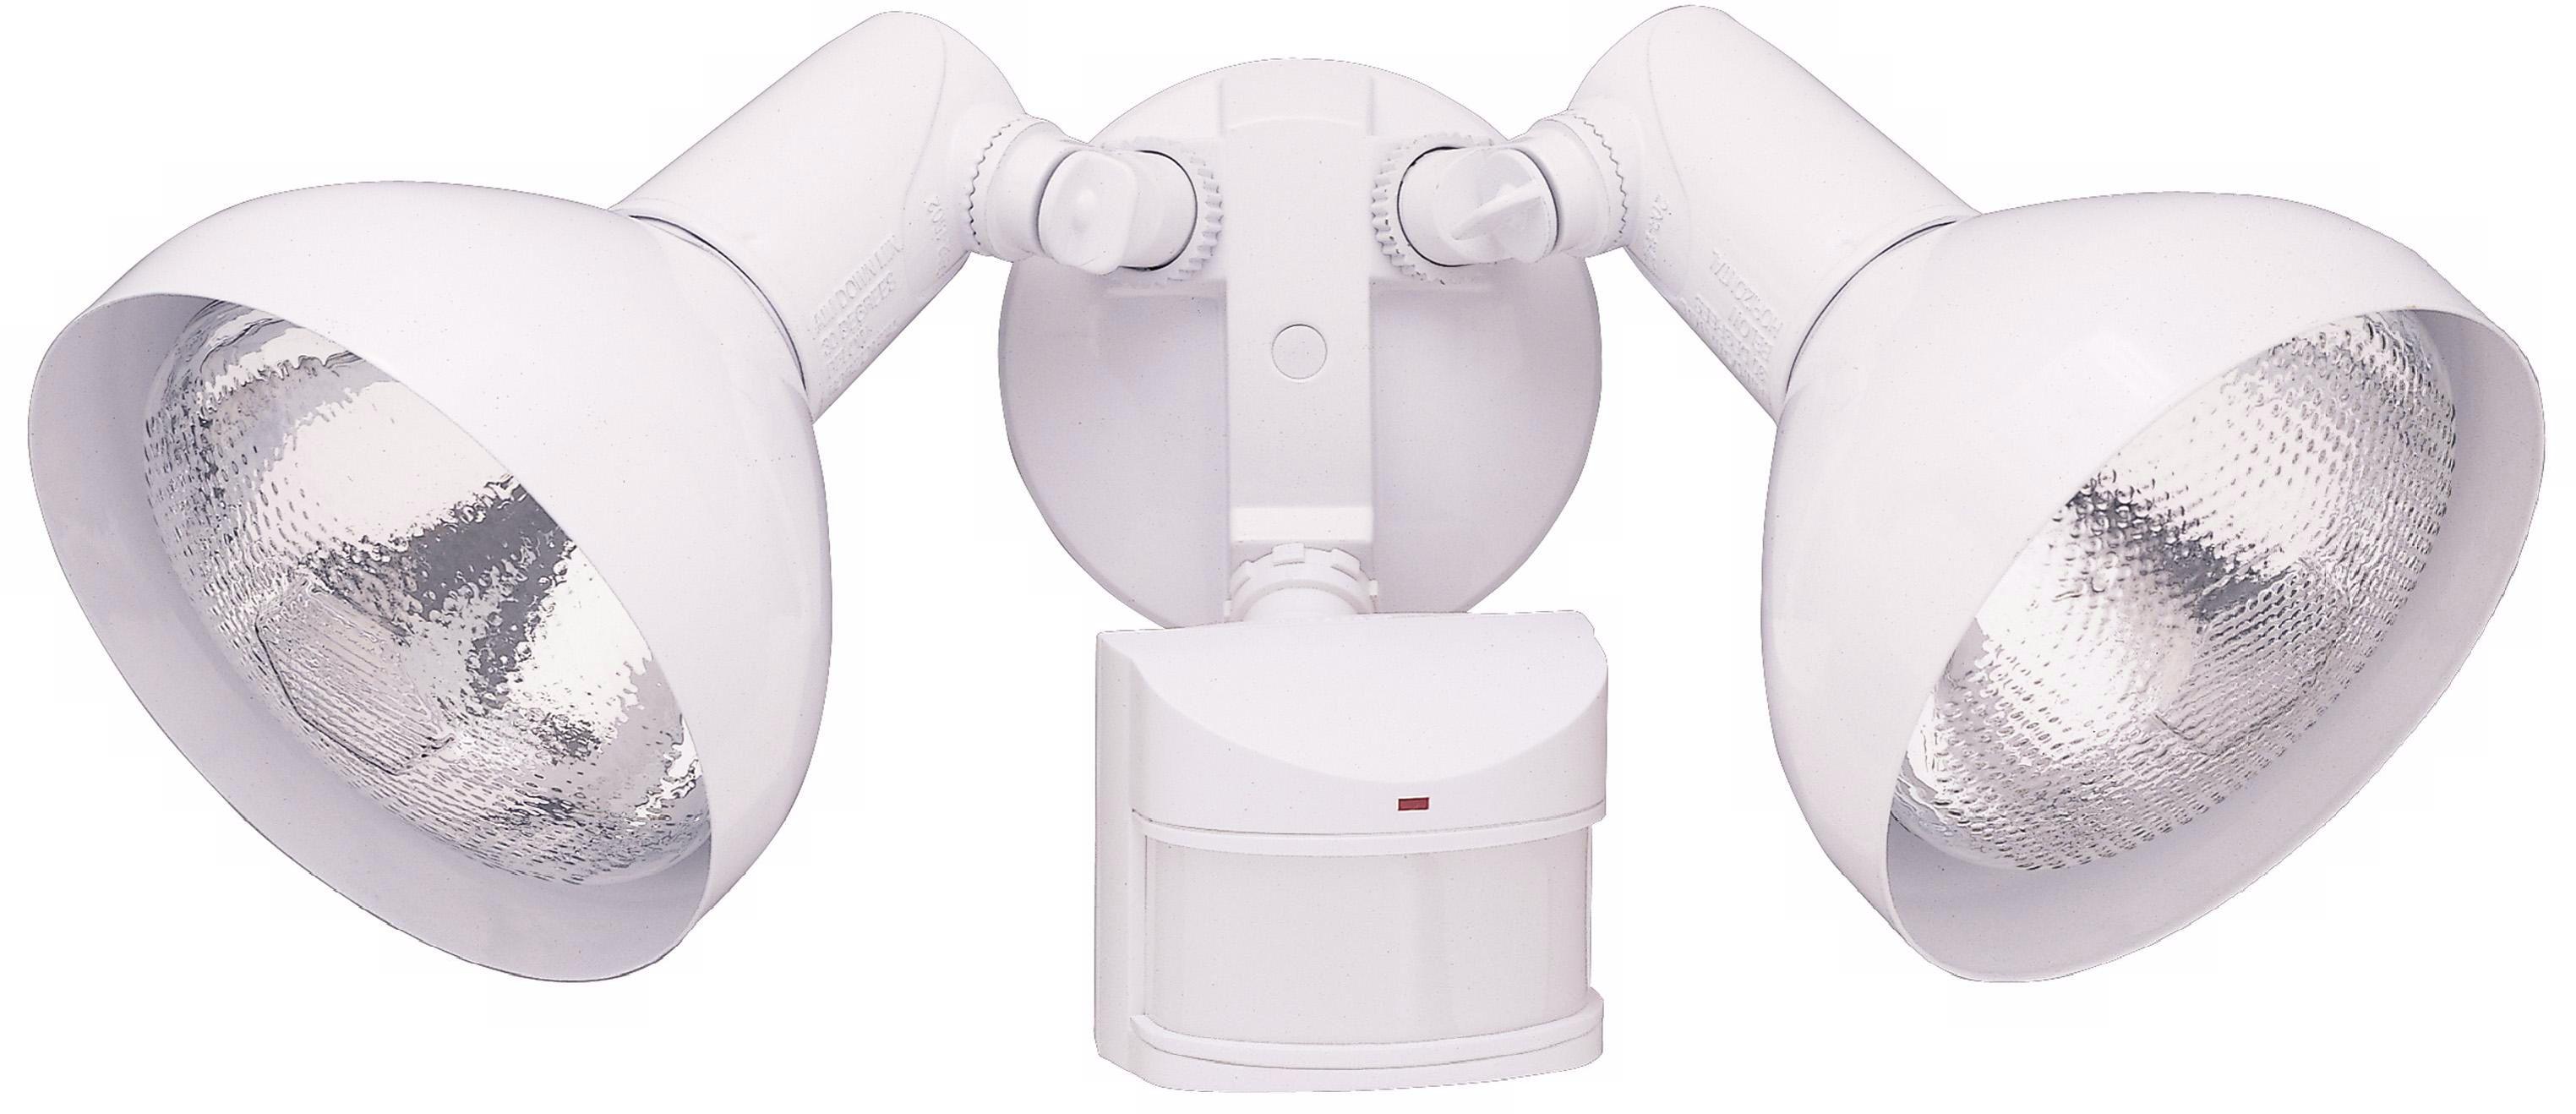 Two Light White Adjustable Outdoor Motion Sensor Lights